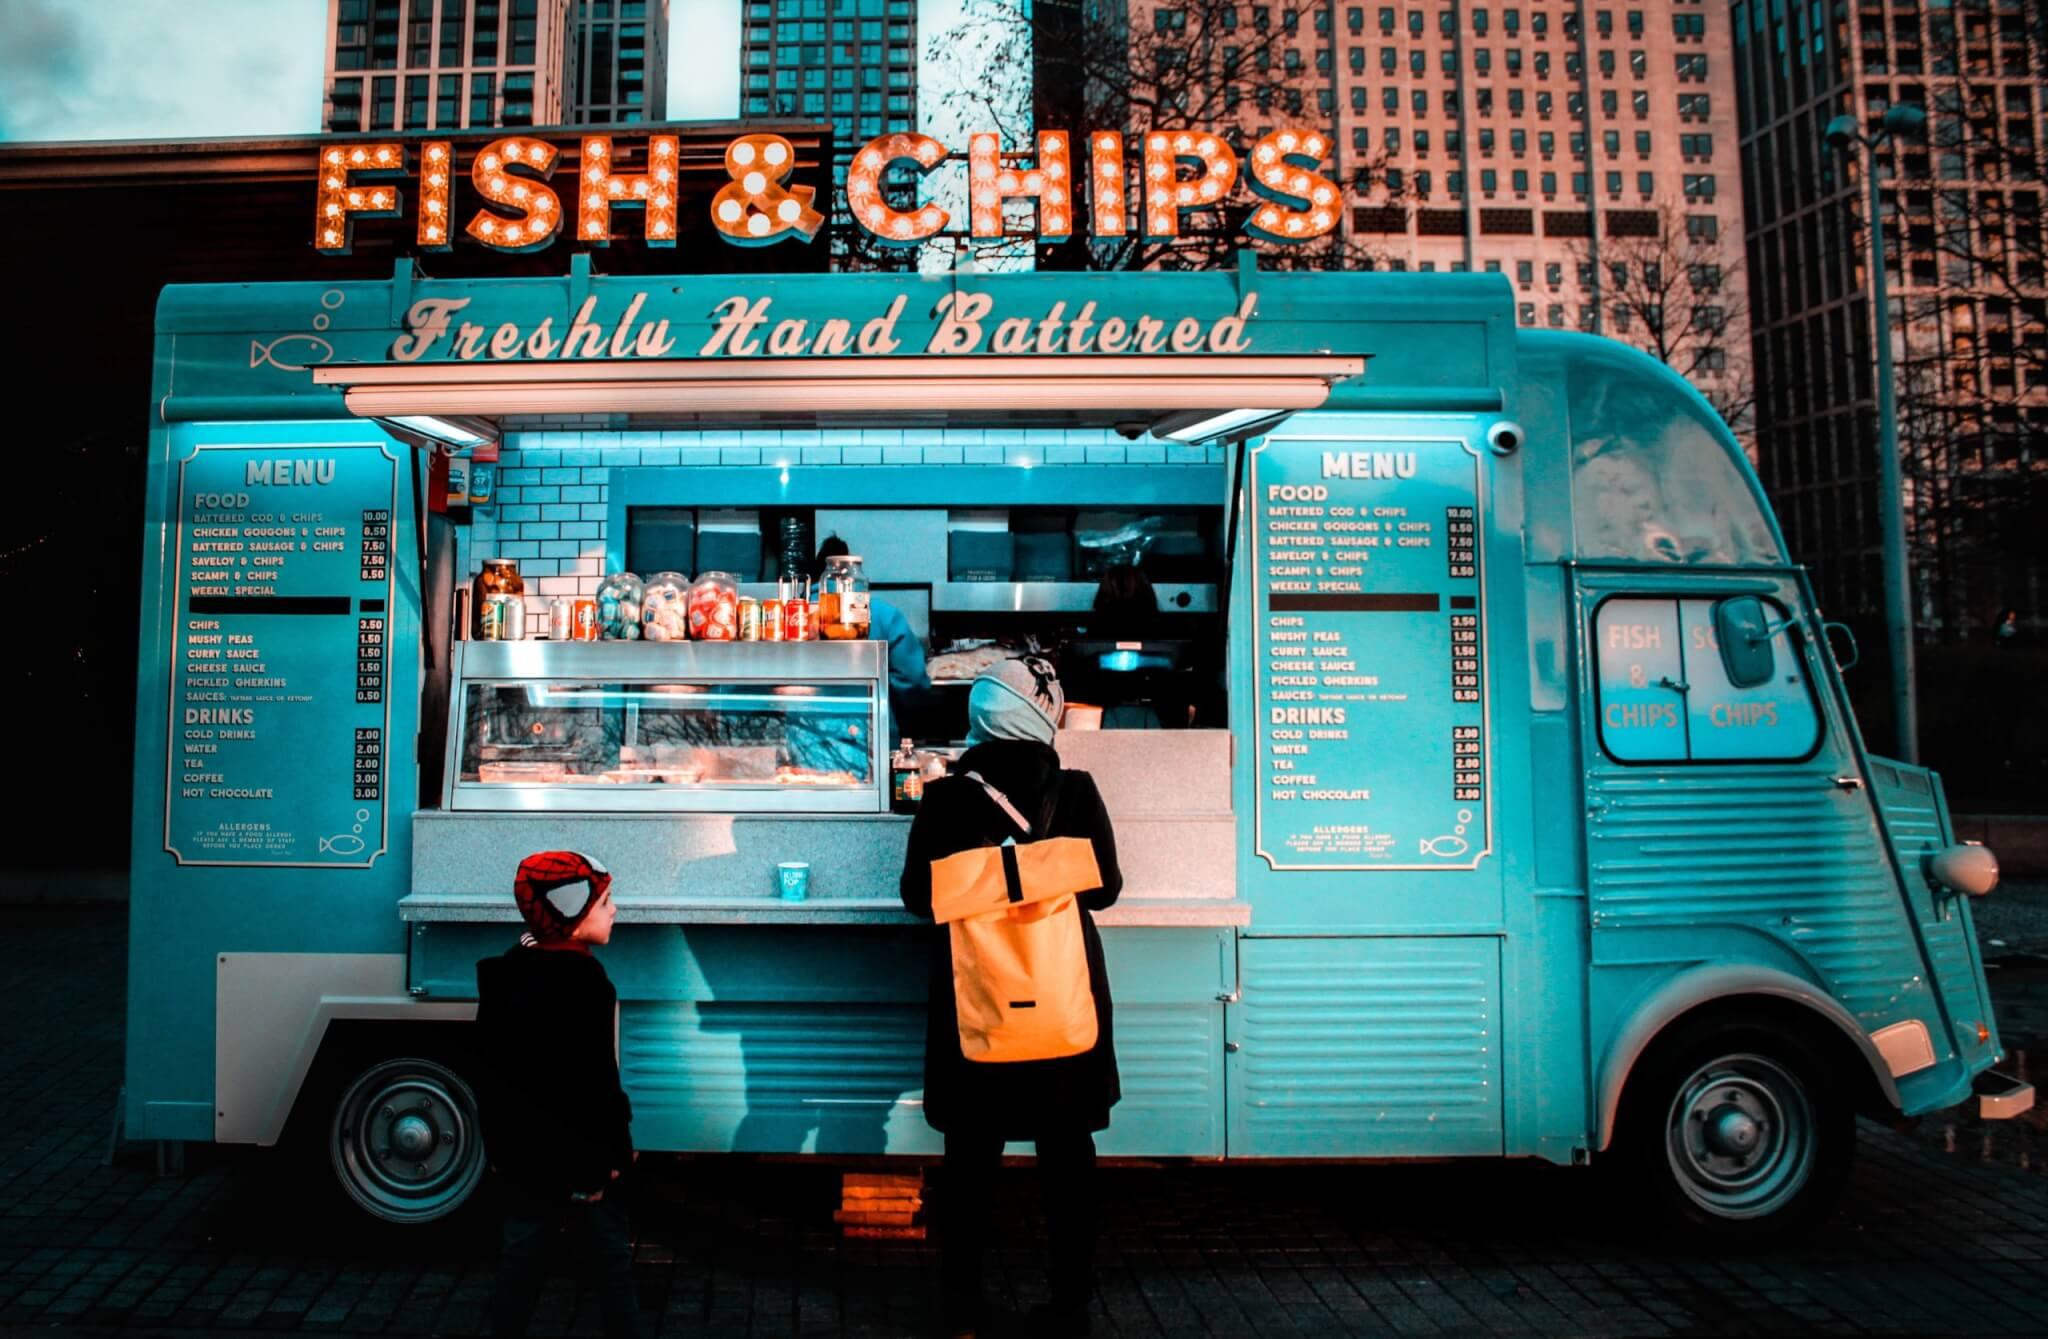 teal food truck serving a customer